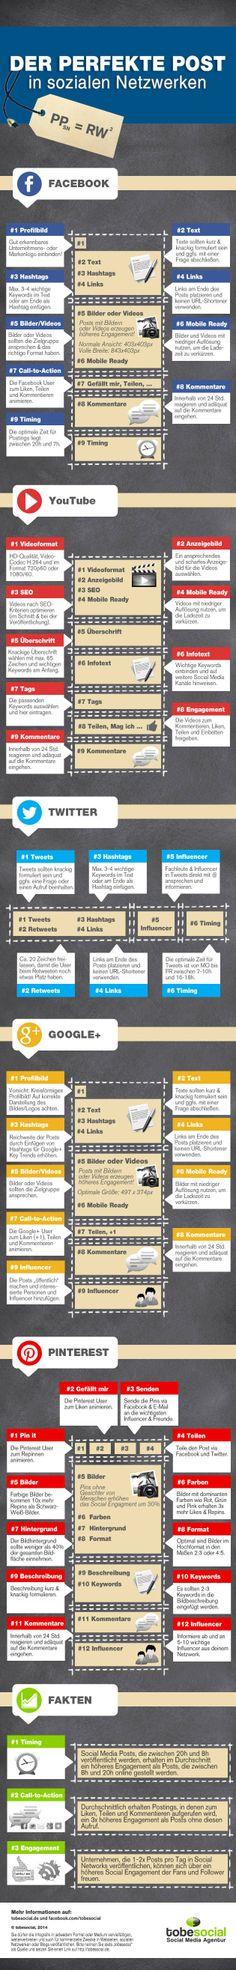 Der perfekte Post in Social Media! Interessante #Infografik. Via tobesocial 2014